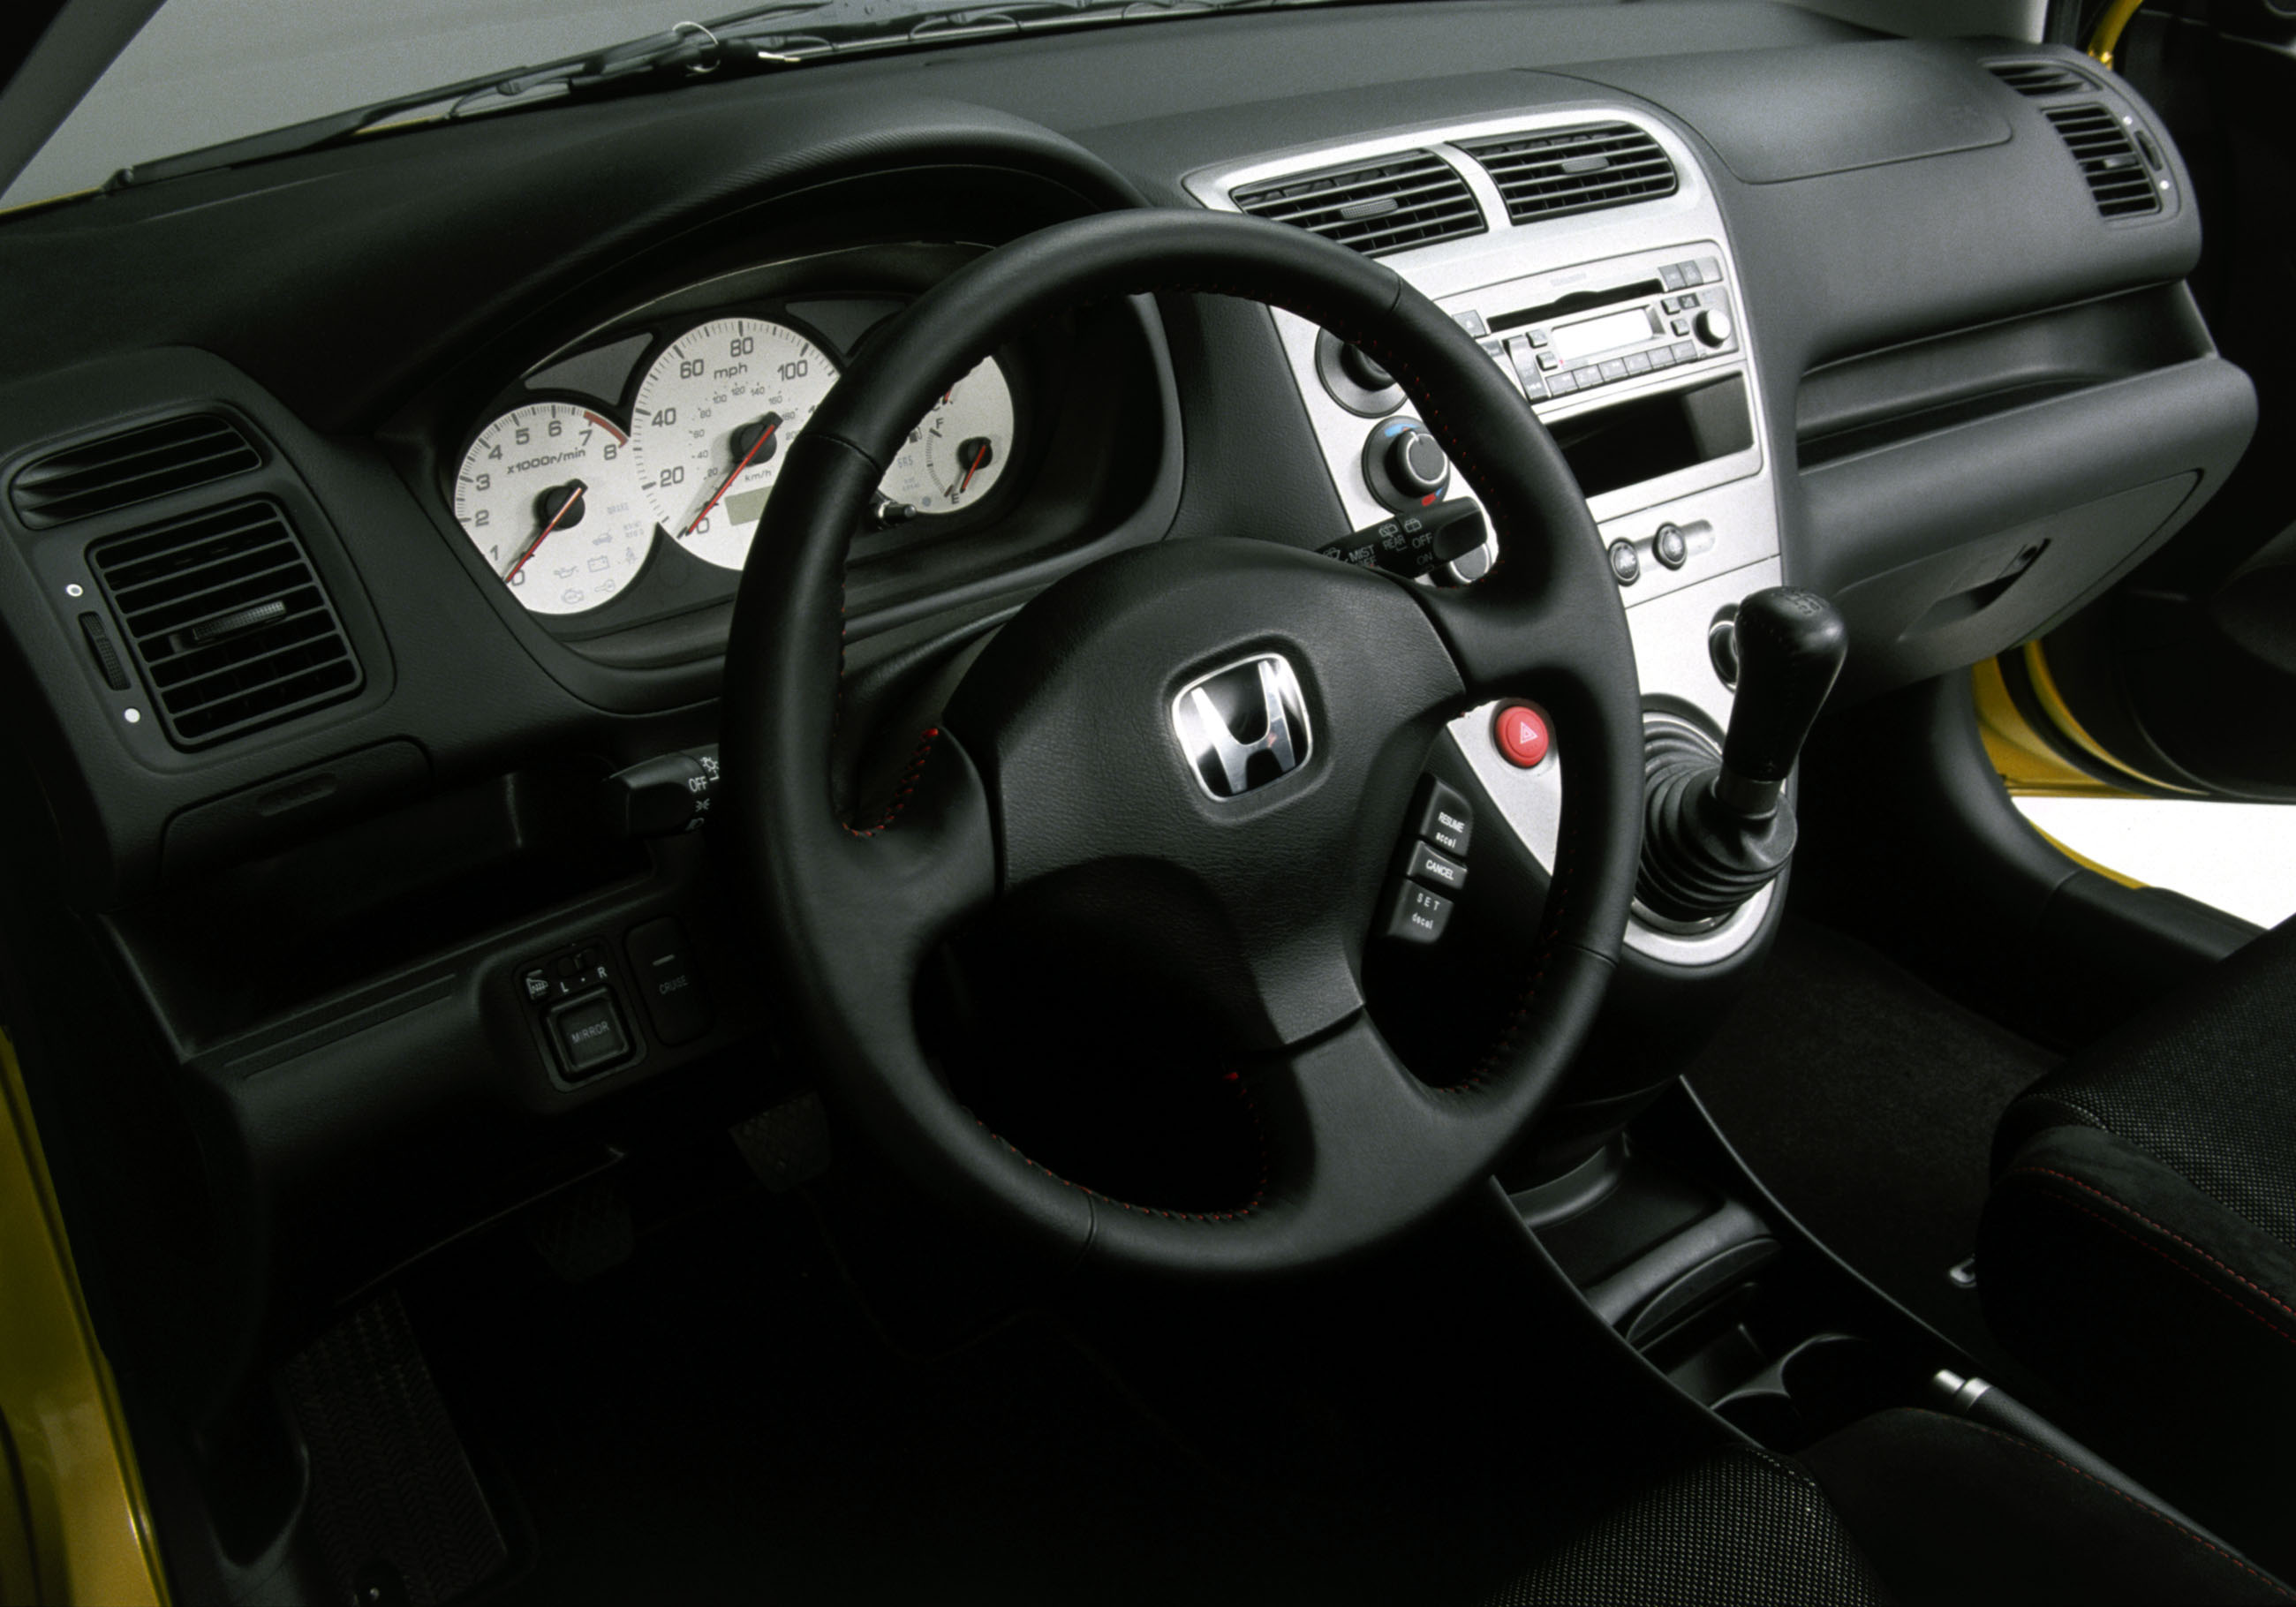 2001 Honda Civic Si Concept Thumbnail Photo 73769